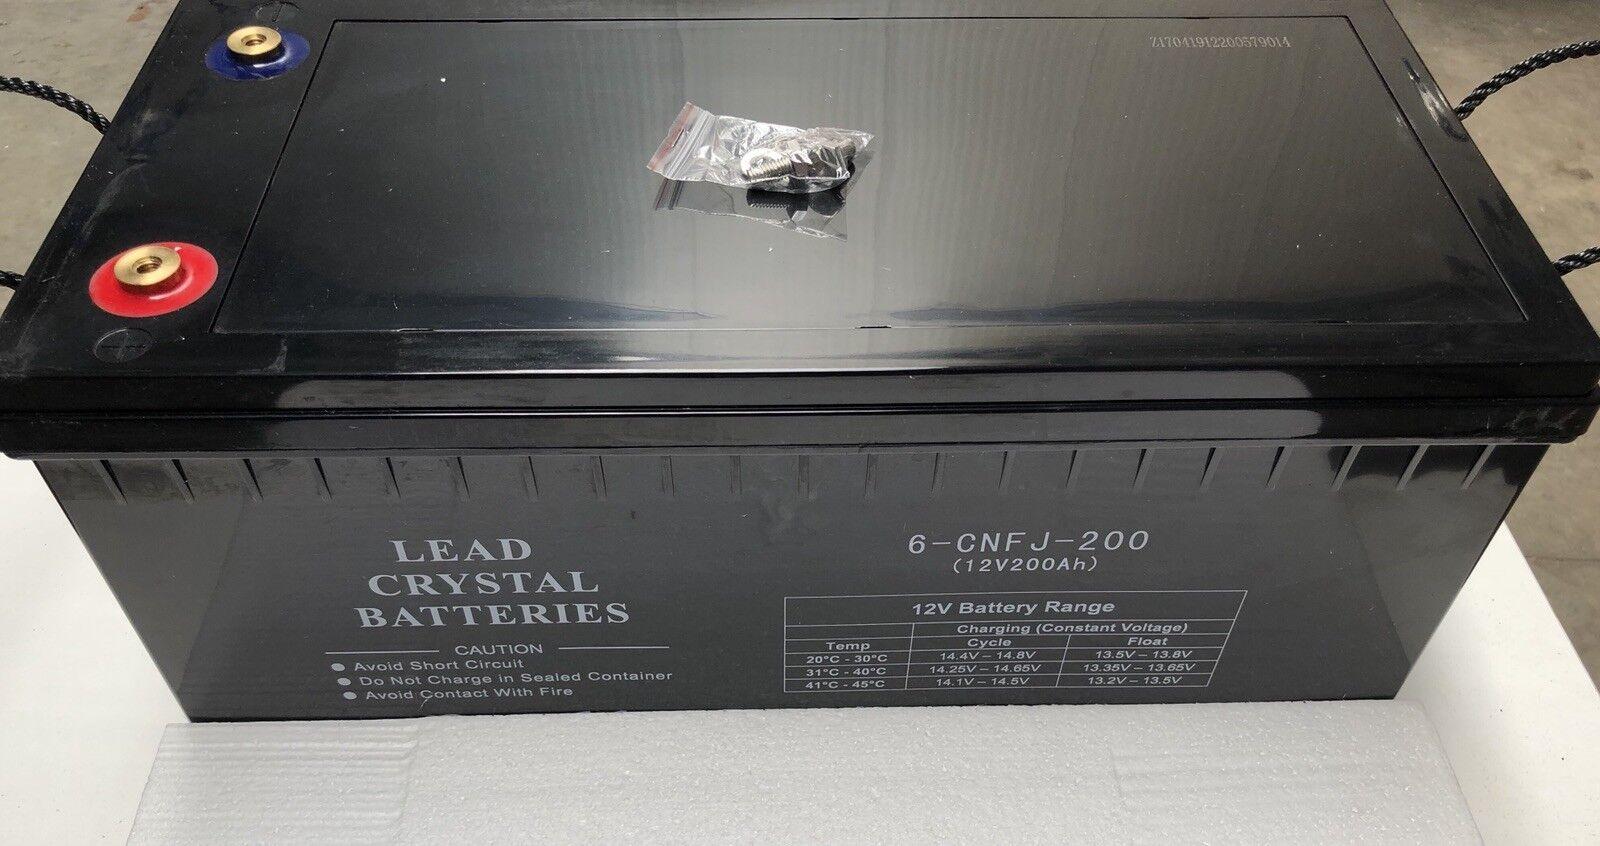 Lead Crystal Batterie   Blei-Kristall Batterie   12V 200Ah   Akku   6-CNFJ-200